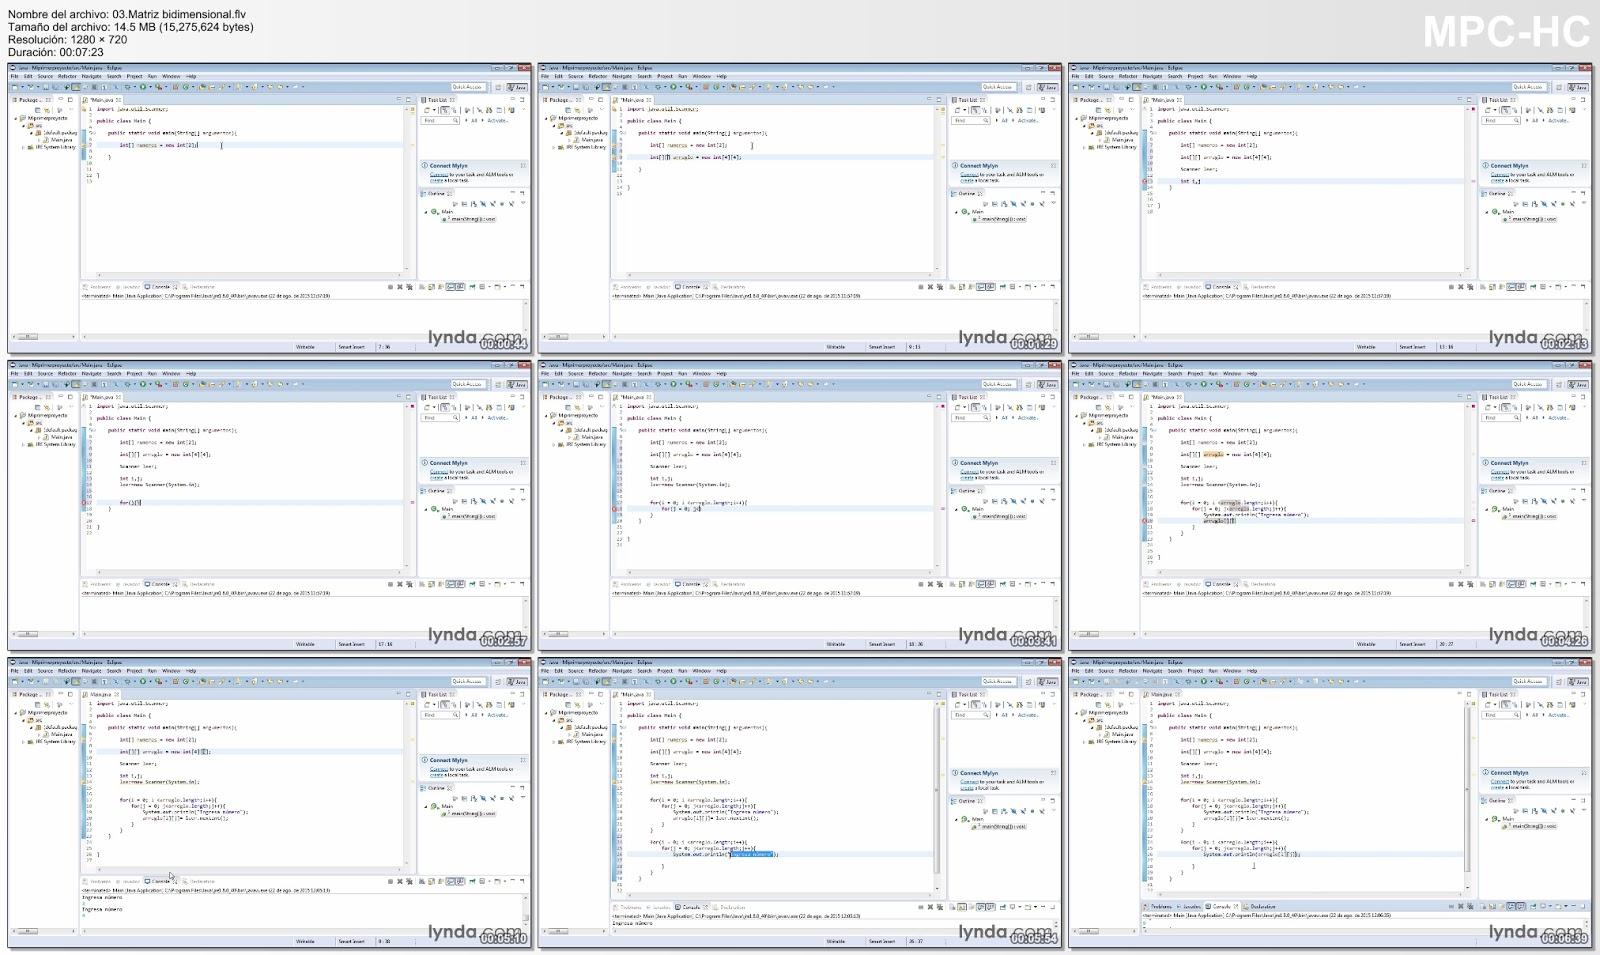 Matriz bidimensional curso video2brain Java